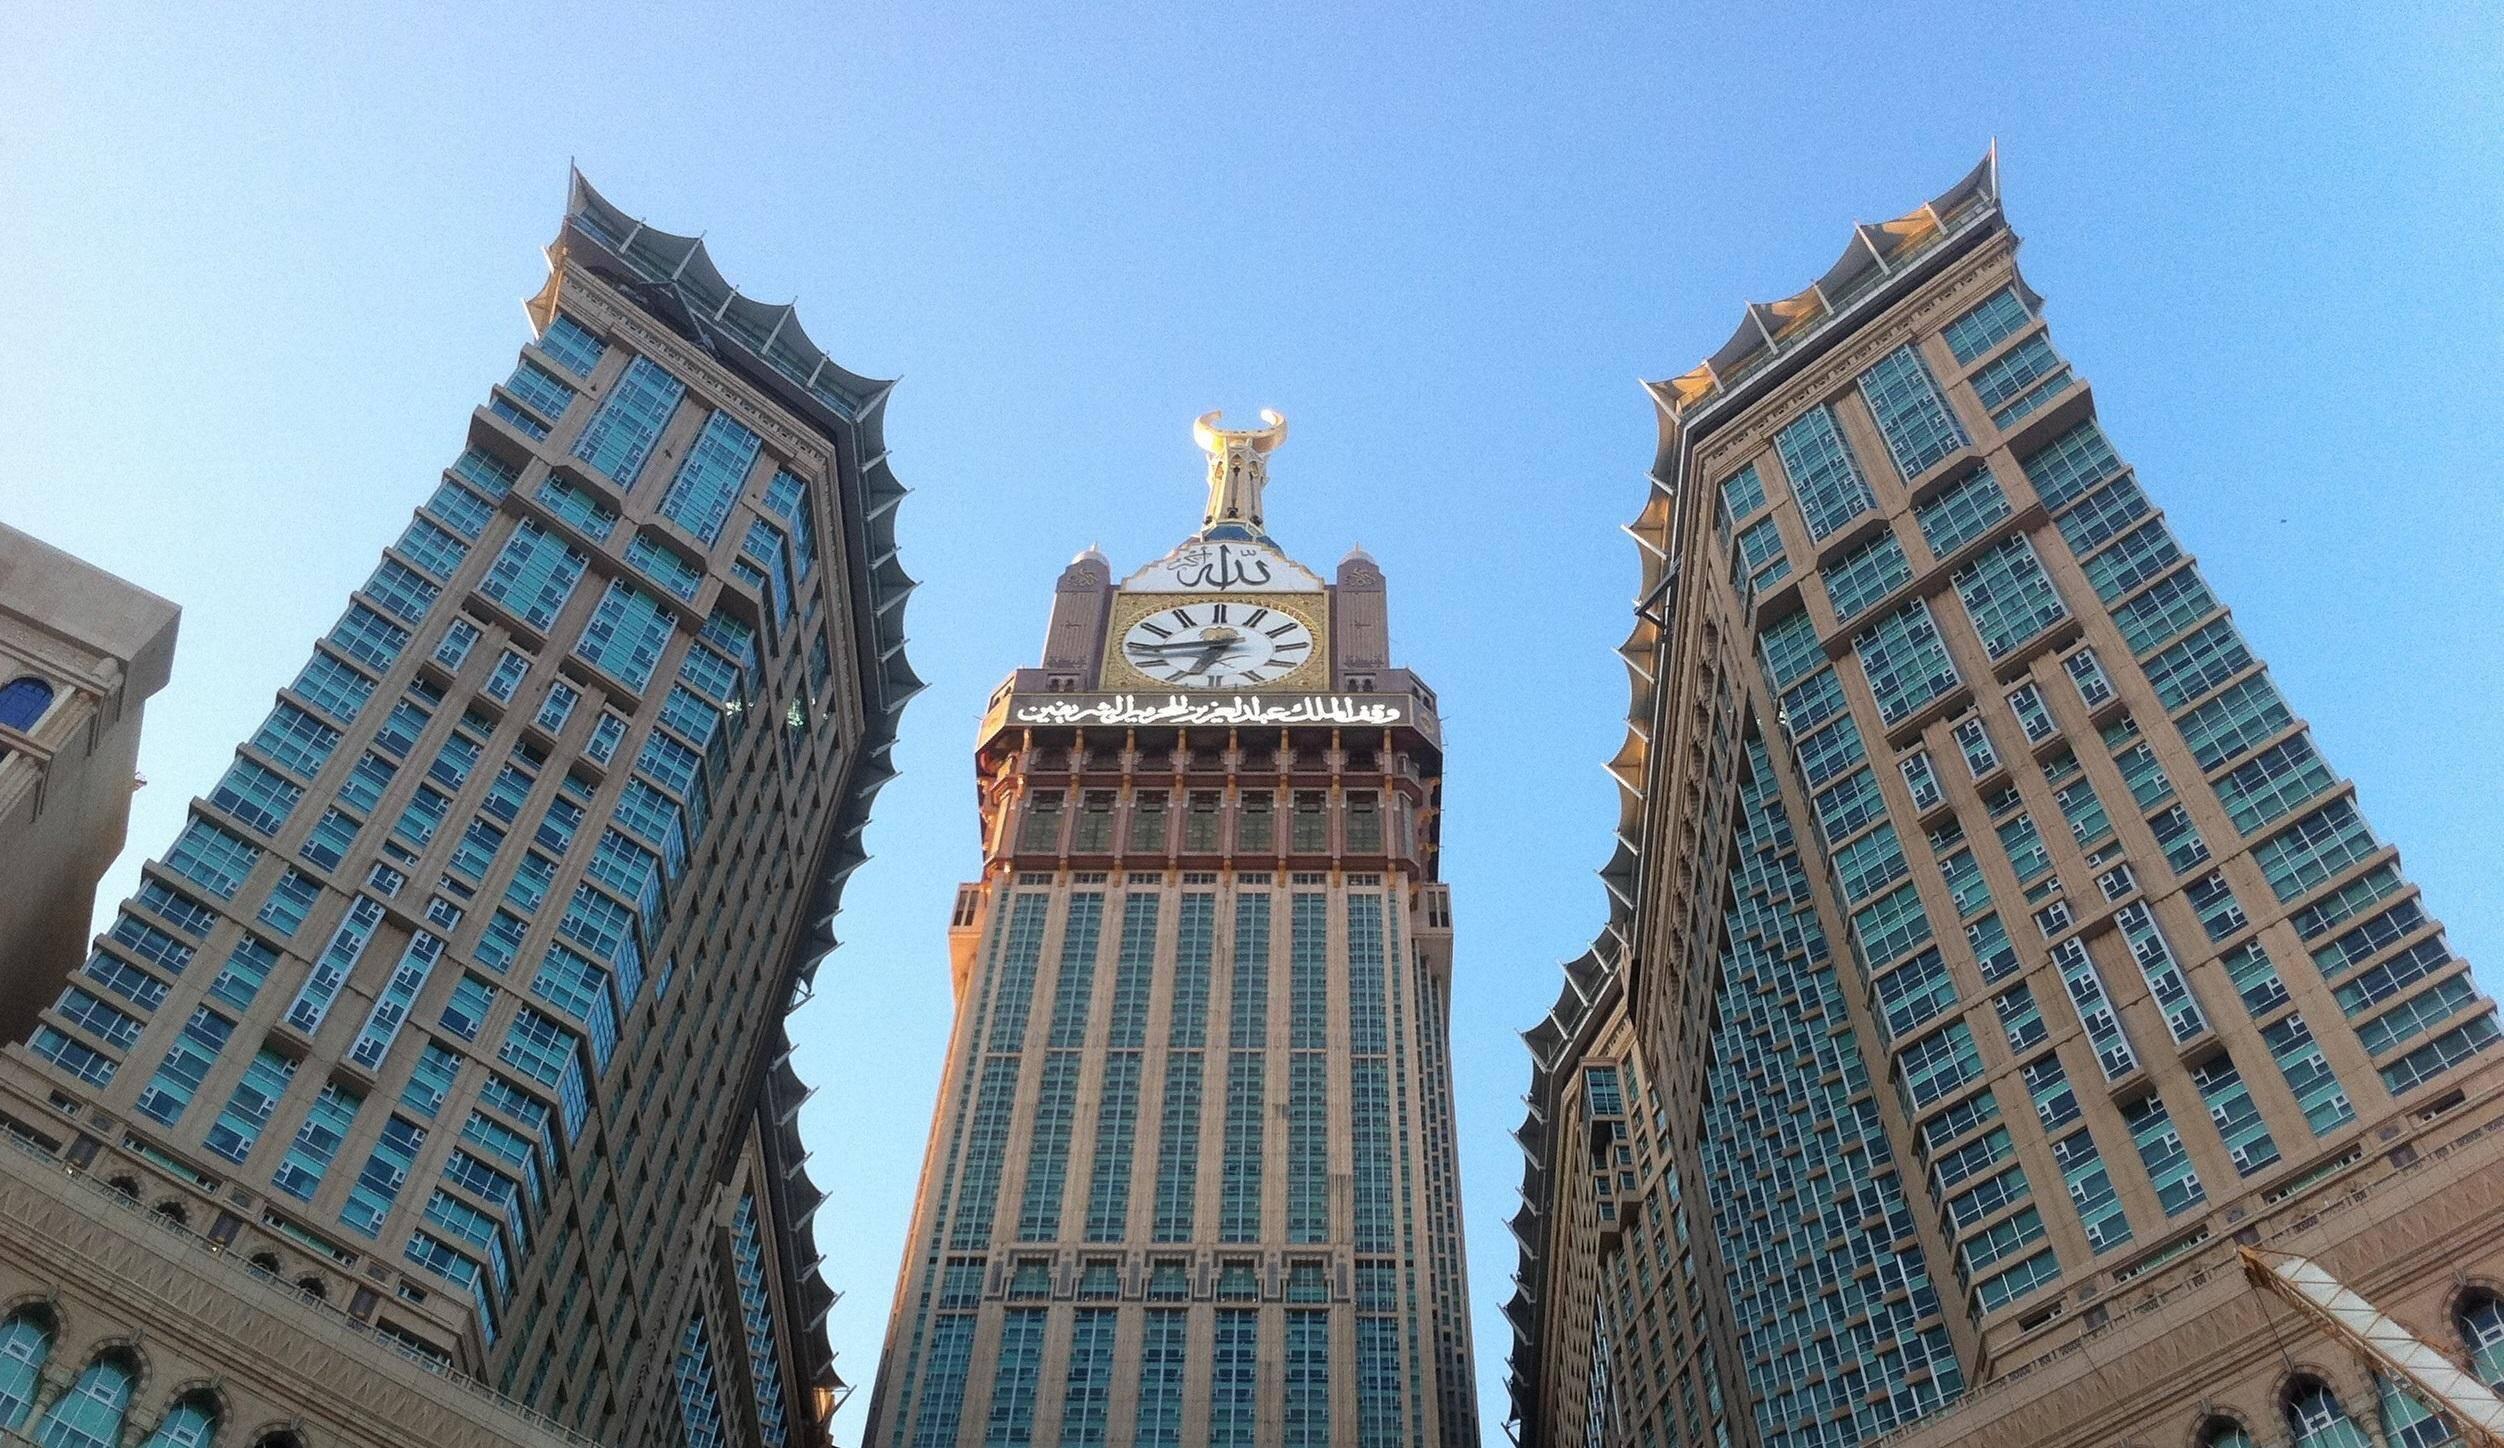 m venpick hotel residences hajar tower makkah mecca. Black Bedroom Furniture Sets. Home Design Ideas